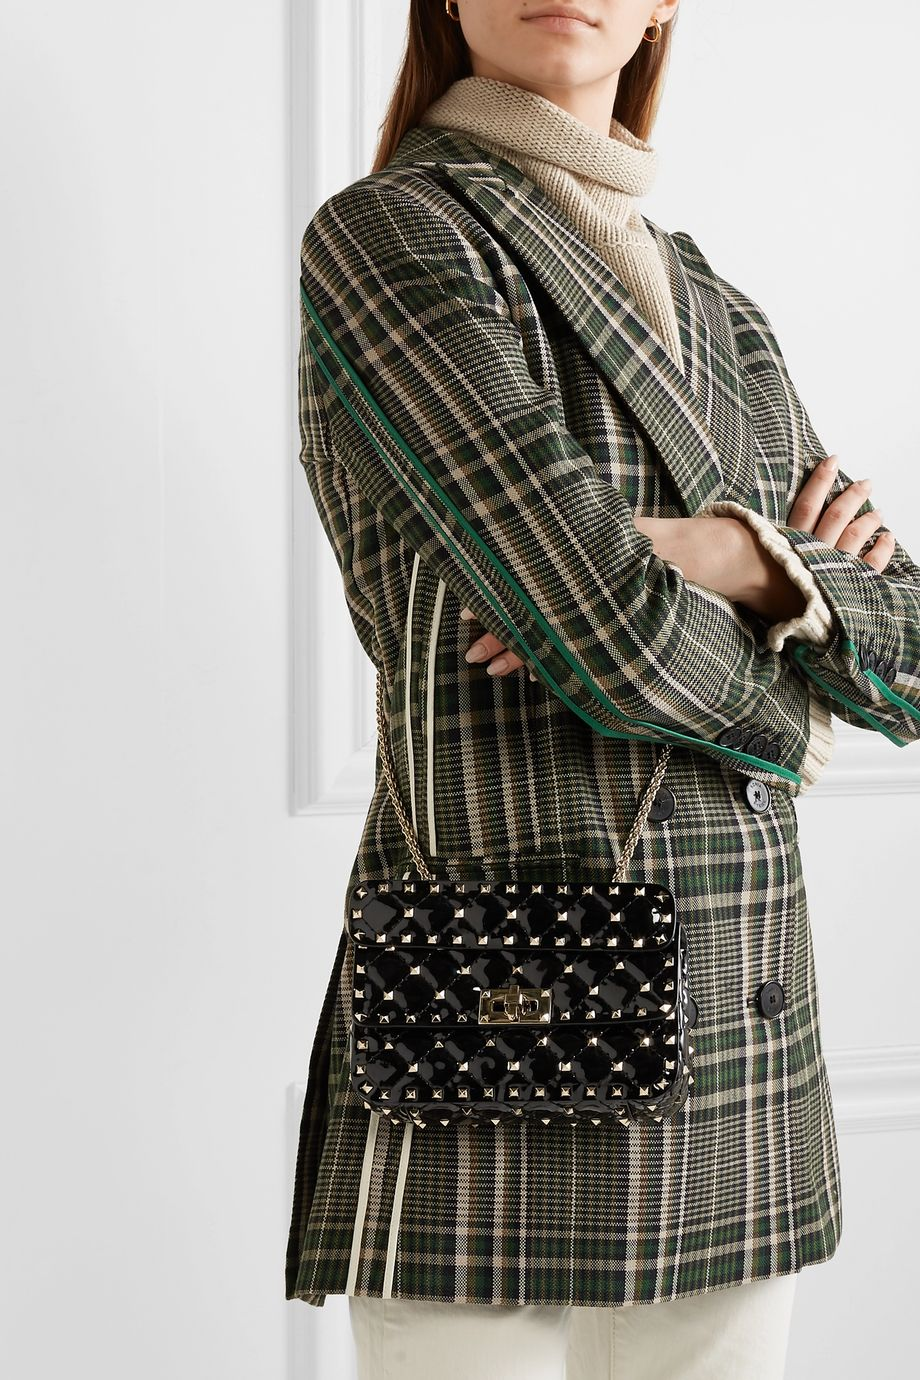 Valentino Valentino Garavani Rockstud Spike small quilted patent-leather shoulder bag